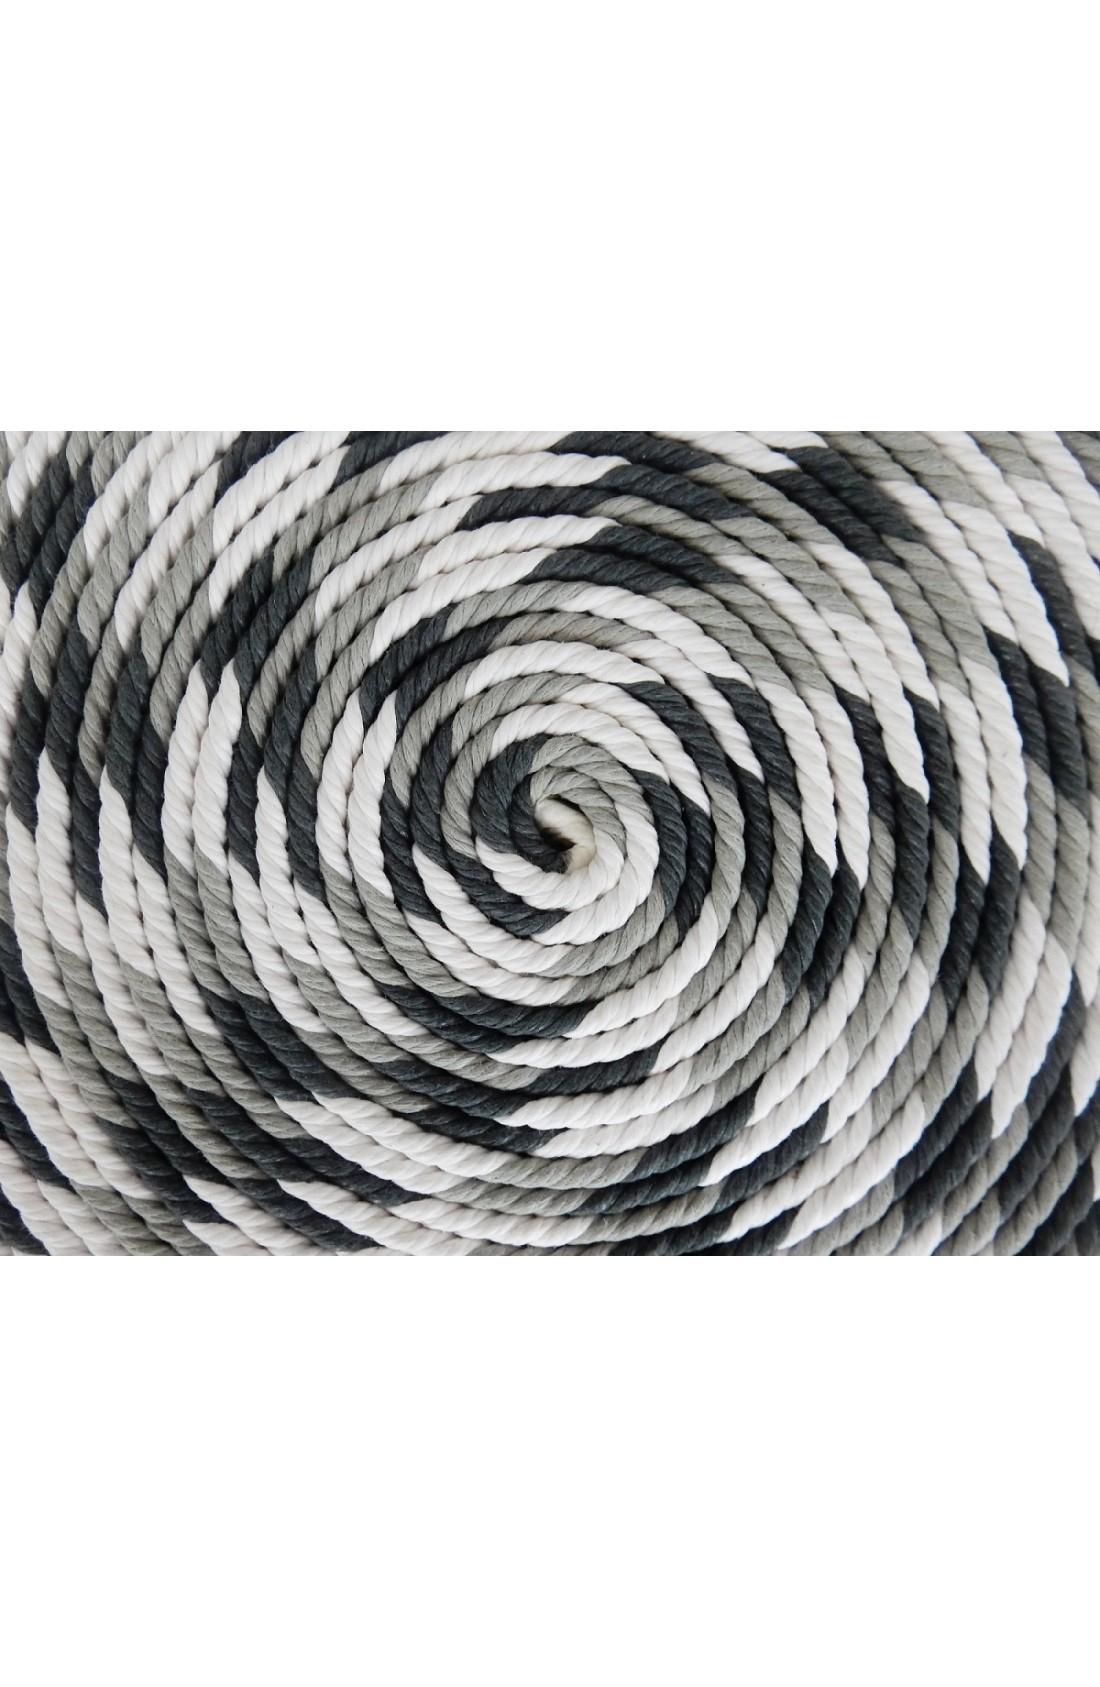 art. 96 INTRECCIO NAVY mm.30 col. bianco - grigio - nero (3)